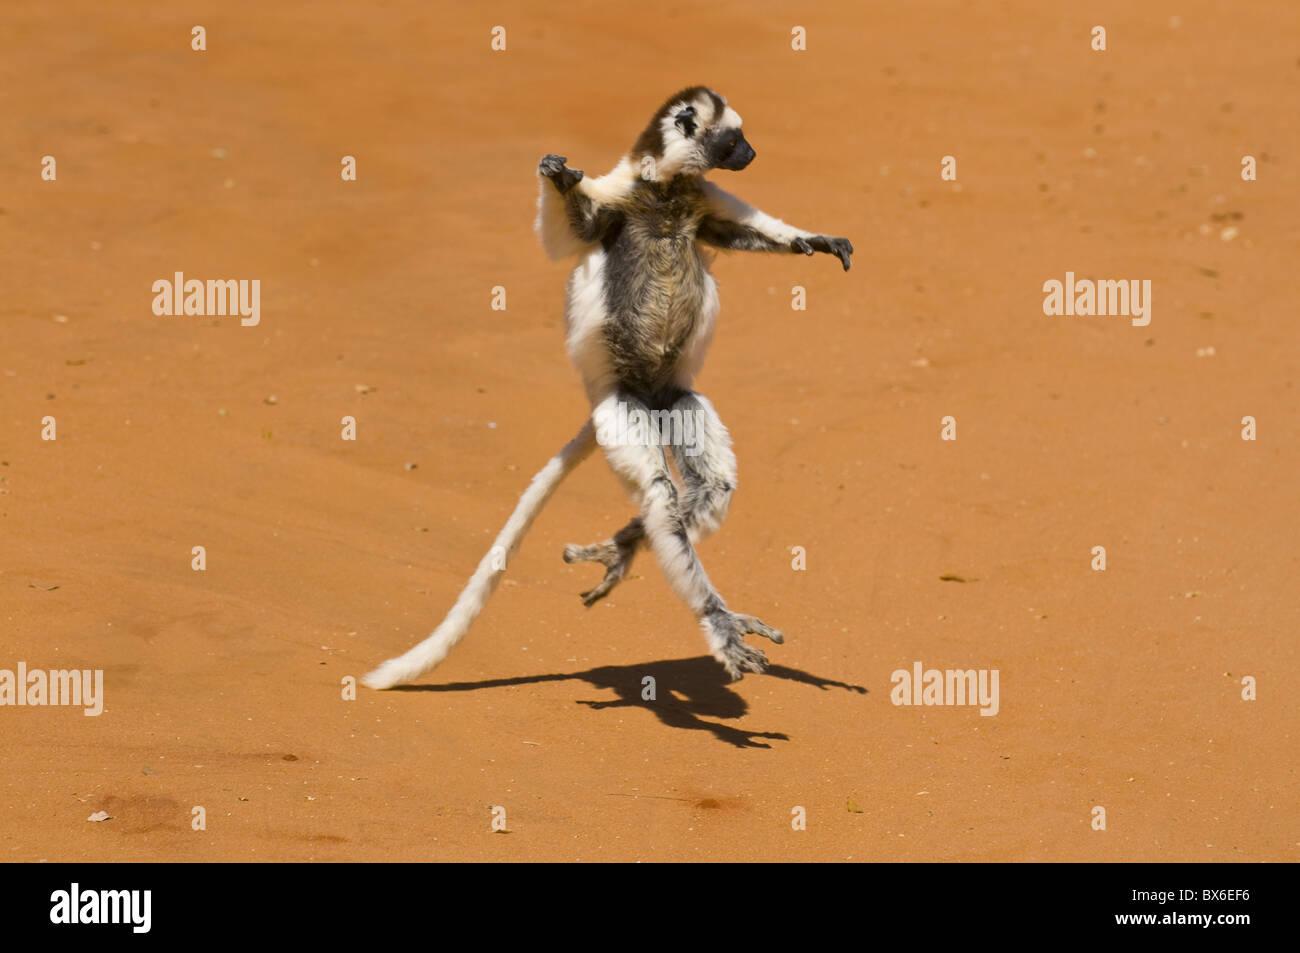 Leaping verreauxi lemur (Verreaux's Sifaka), Berenty Private Reserve, Madagascar, Africa - Stock Image